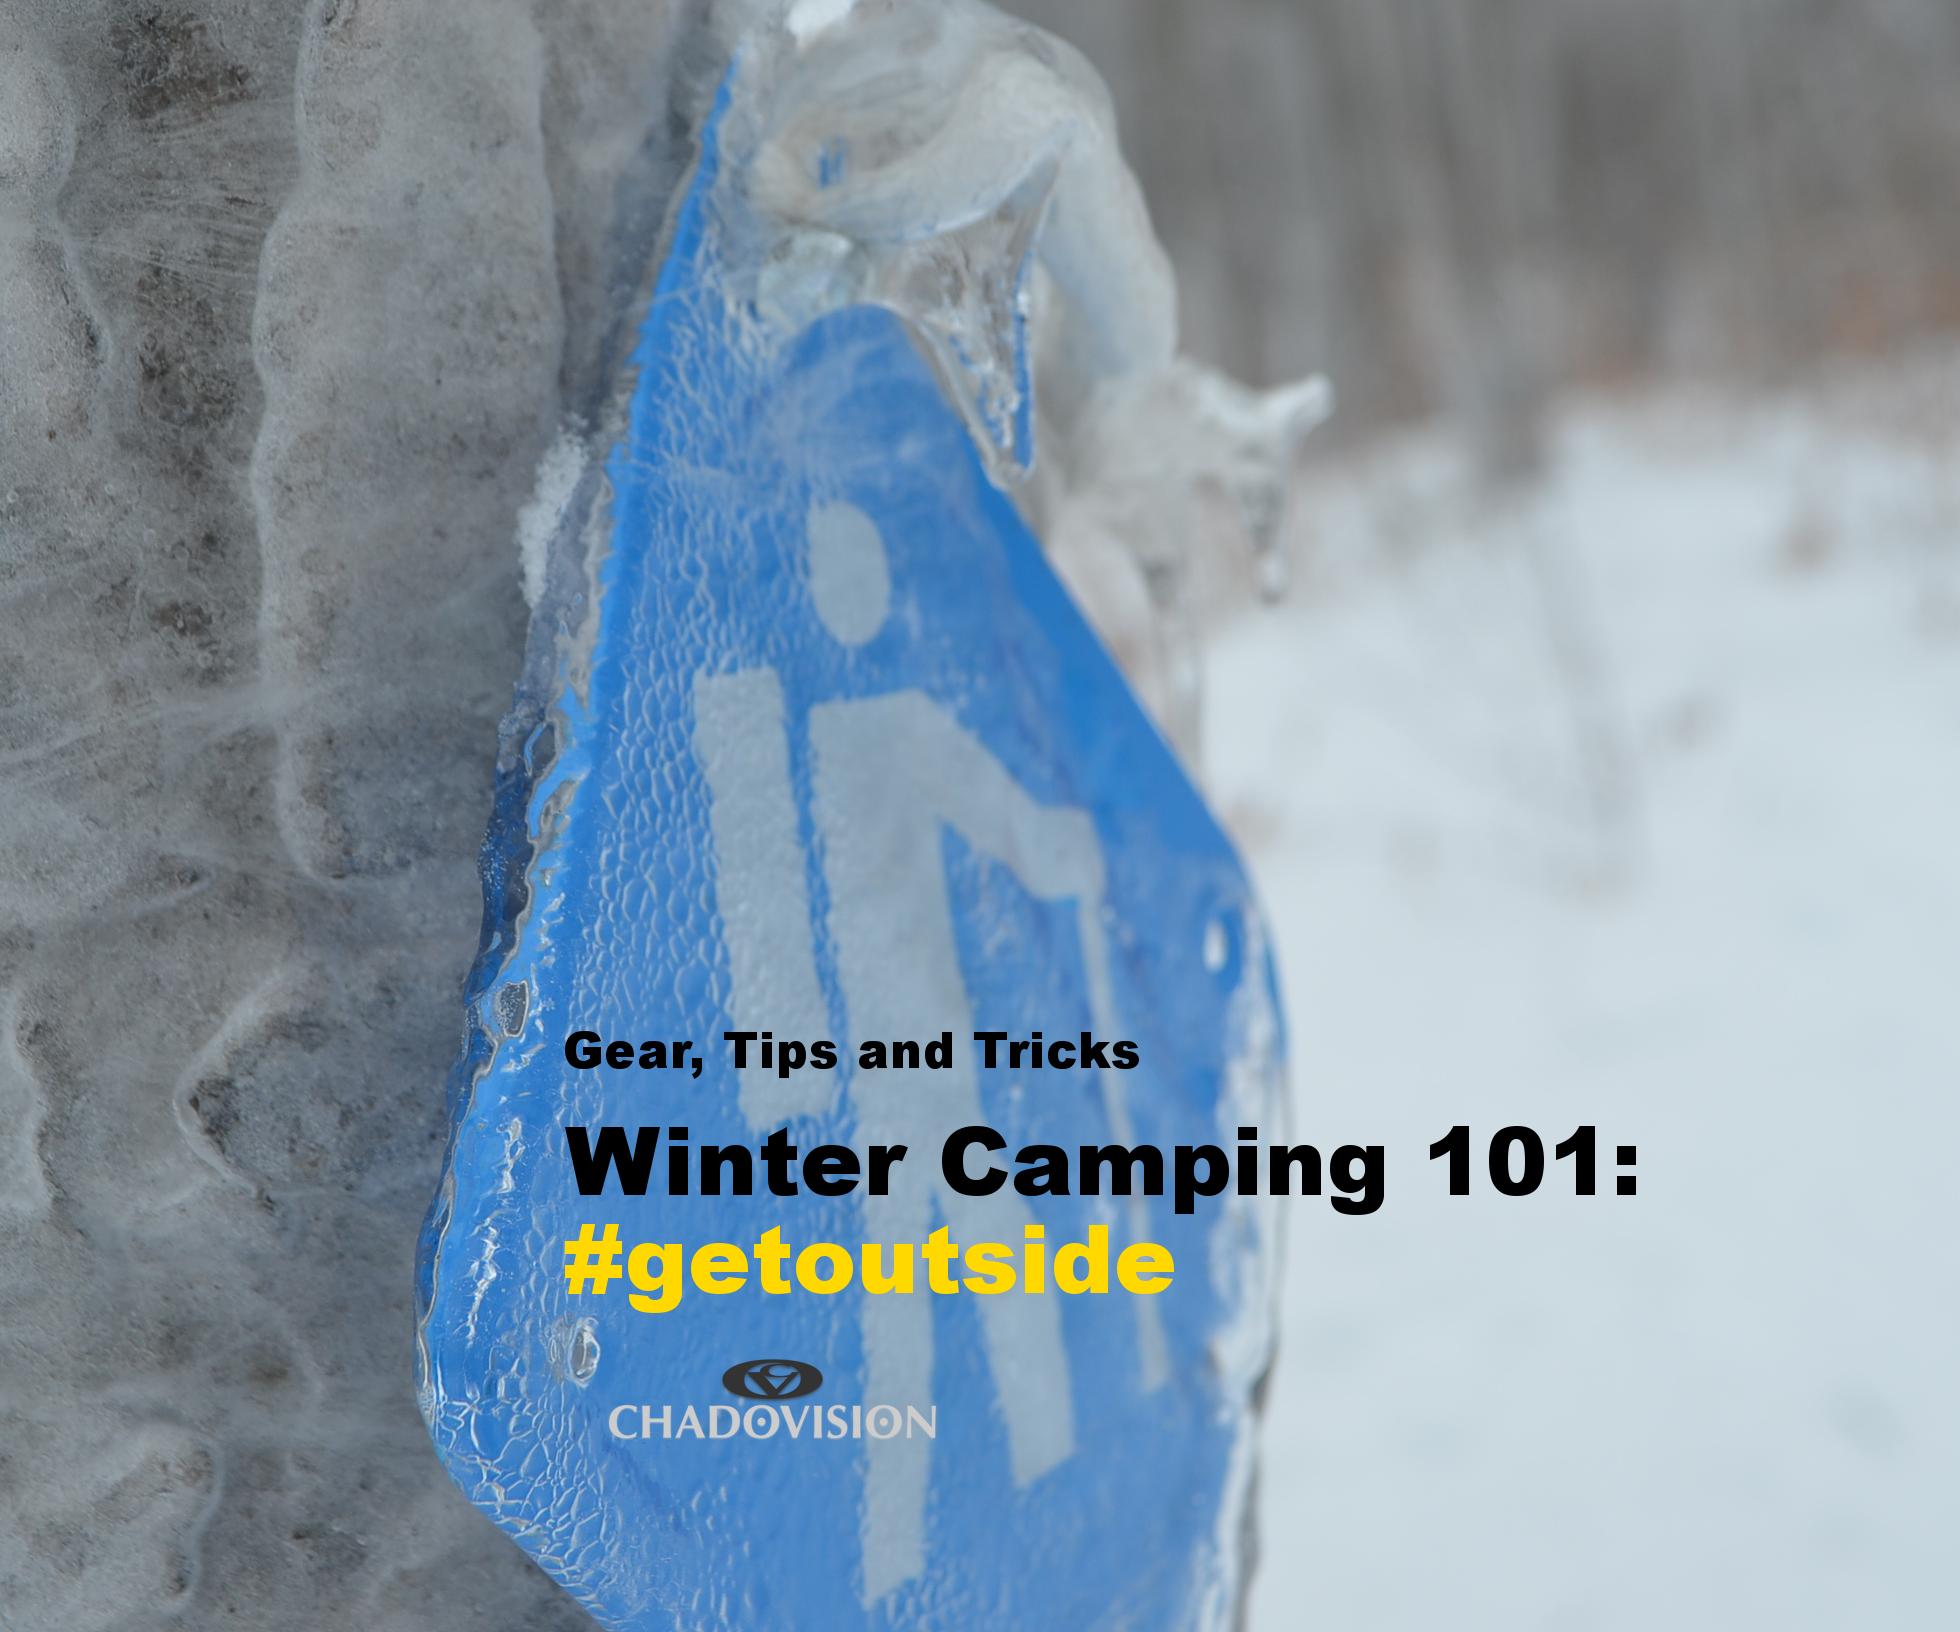 Winter Camping 101